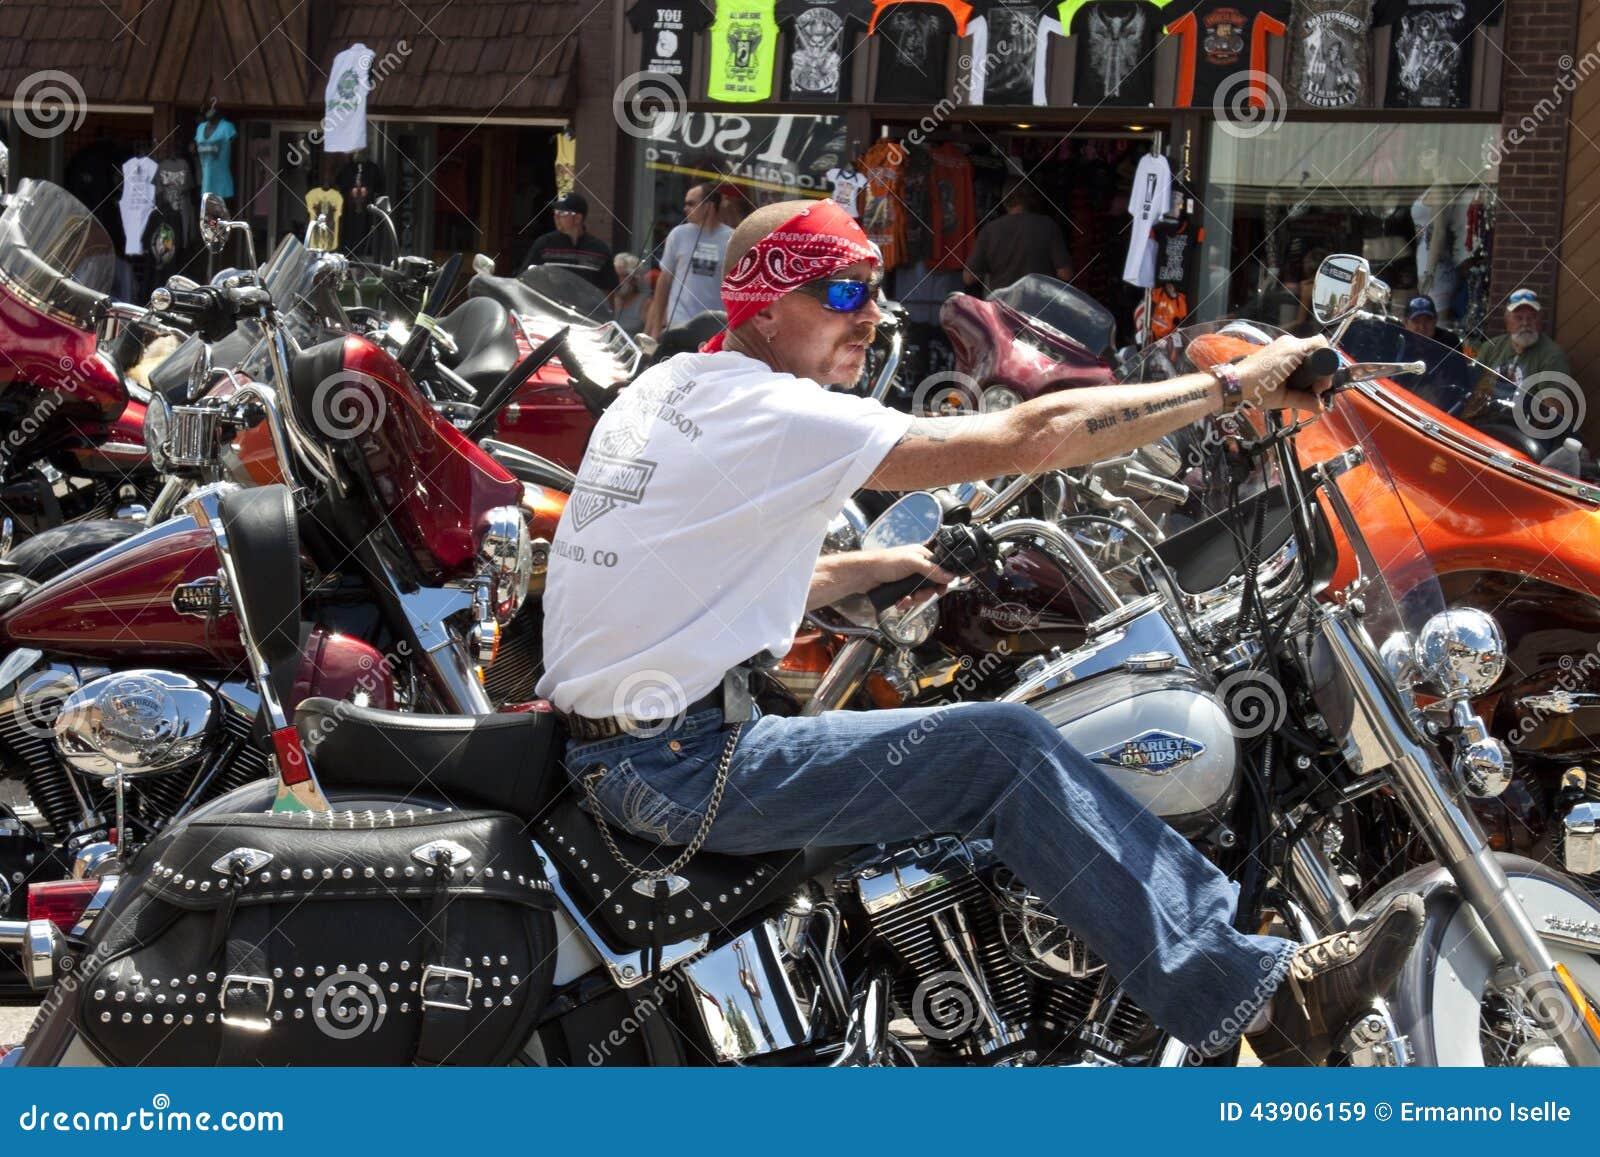 Sturgis rally south dakota